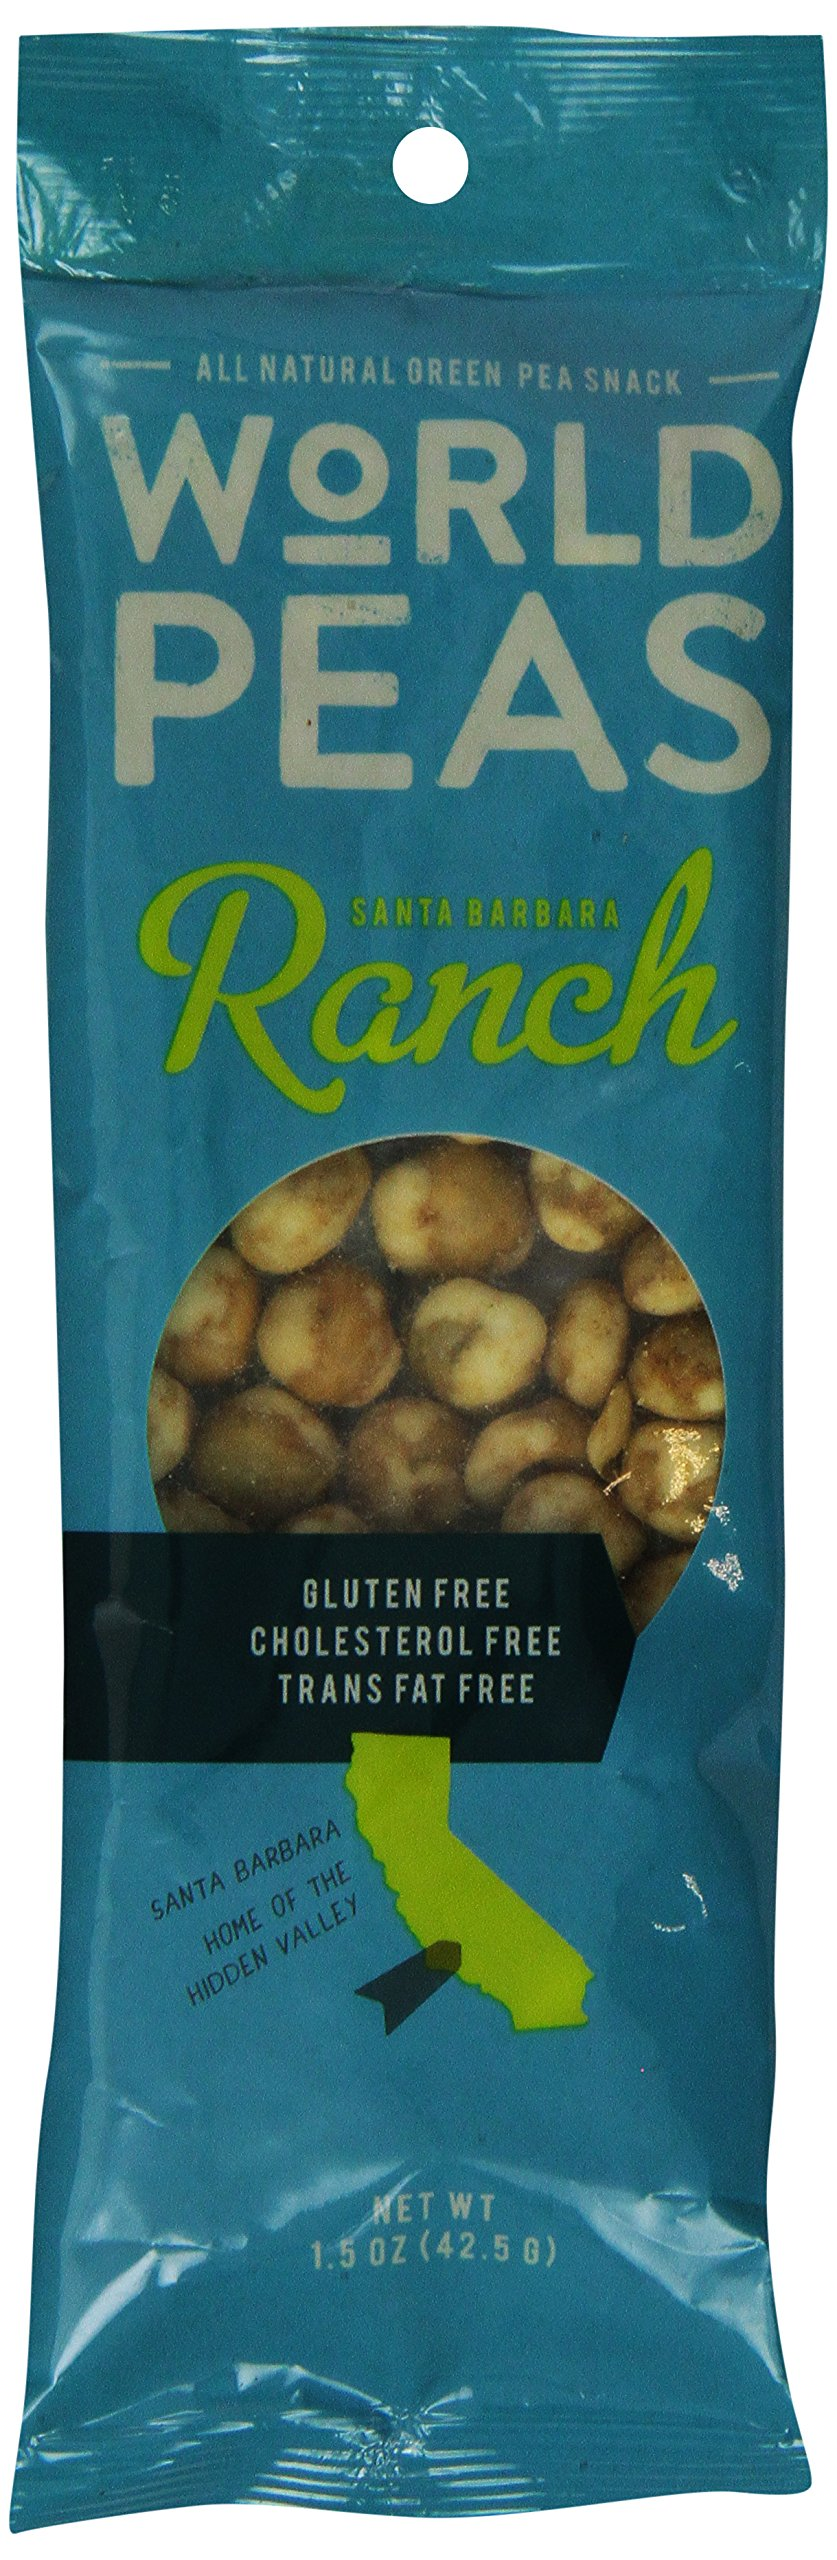 World Peas Santa Barbara Ranch Green Pea Snack, 1.5 Ounce (Pack of 12)